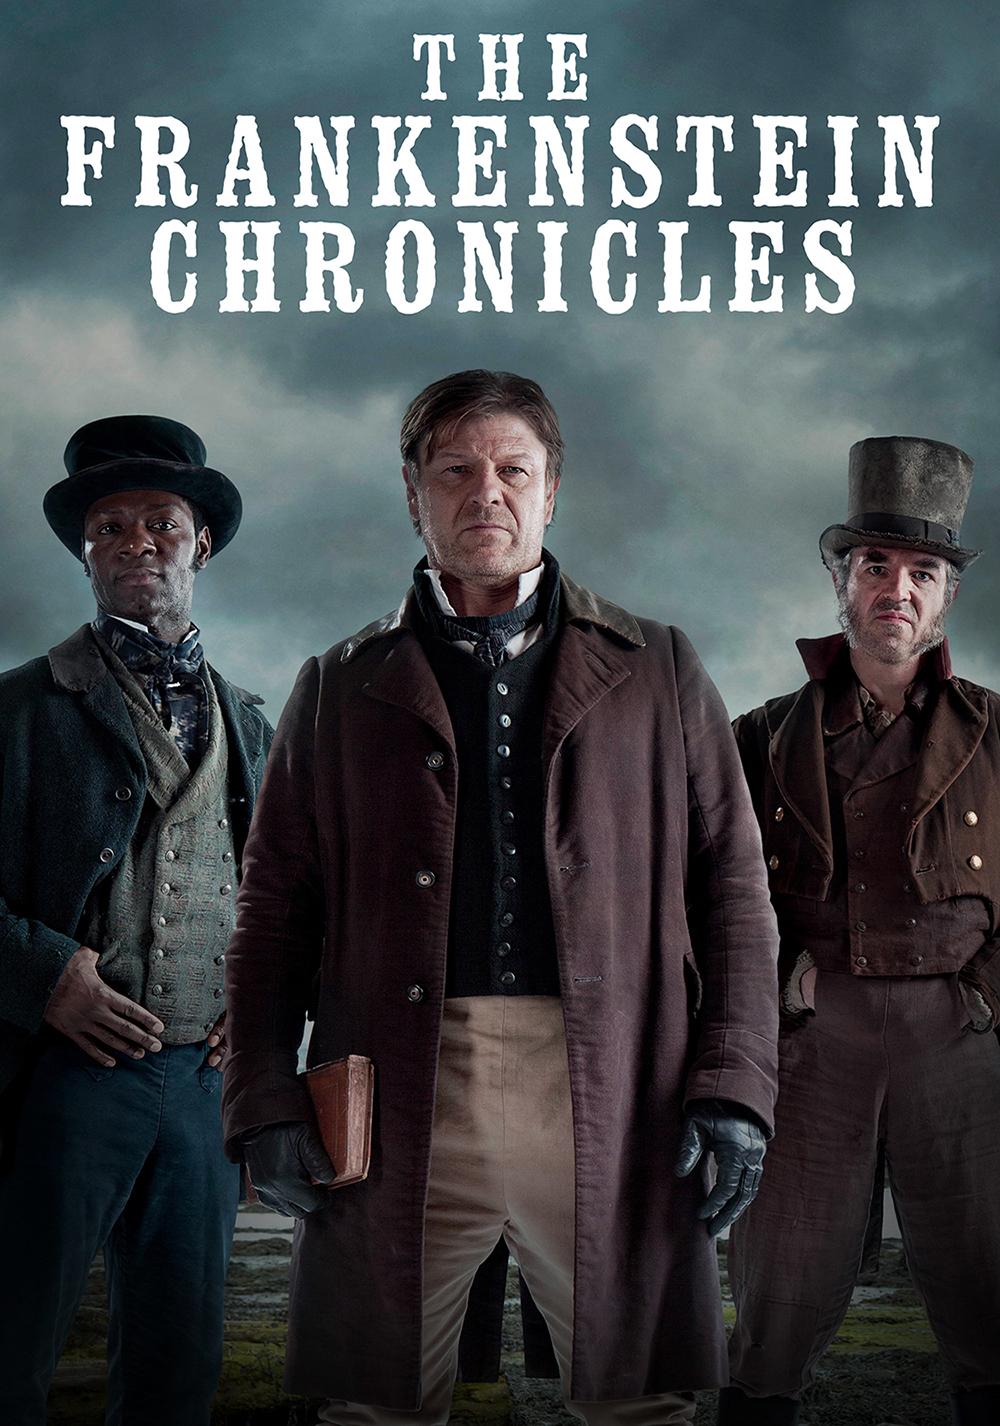 The Frankenstein Chronicles - Dizi 2015 - Beyazperde.com